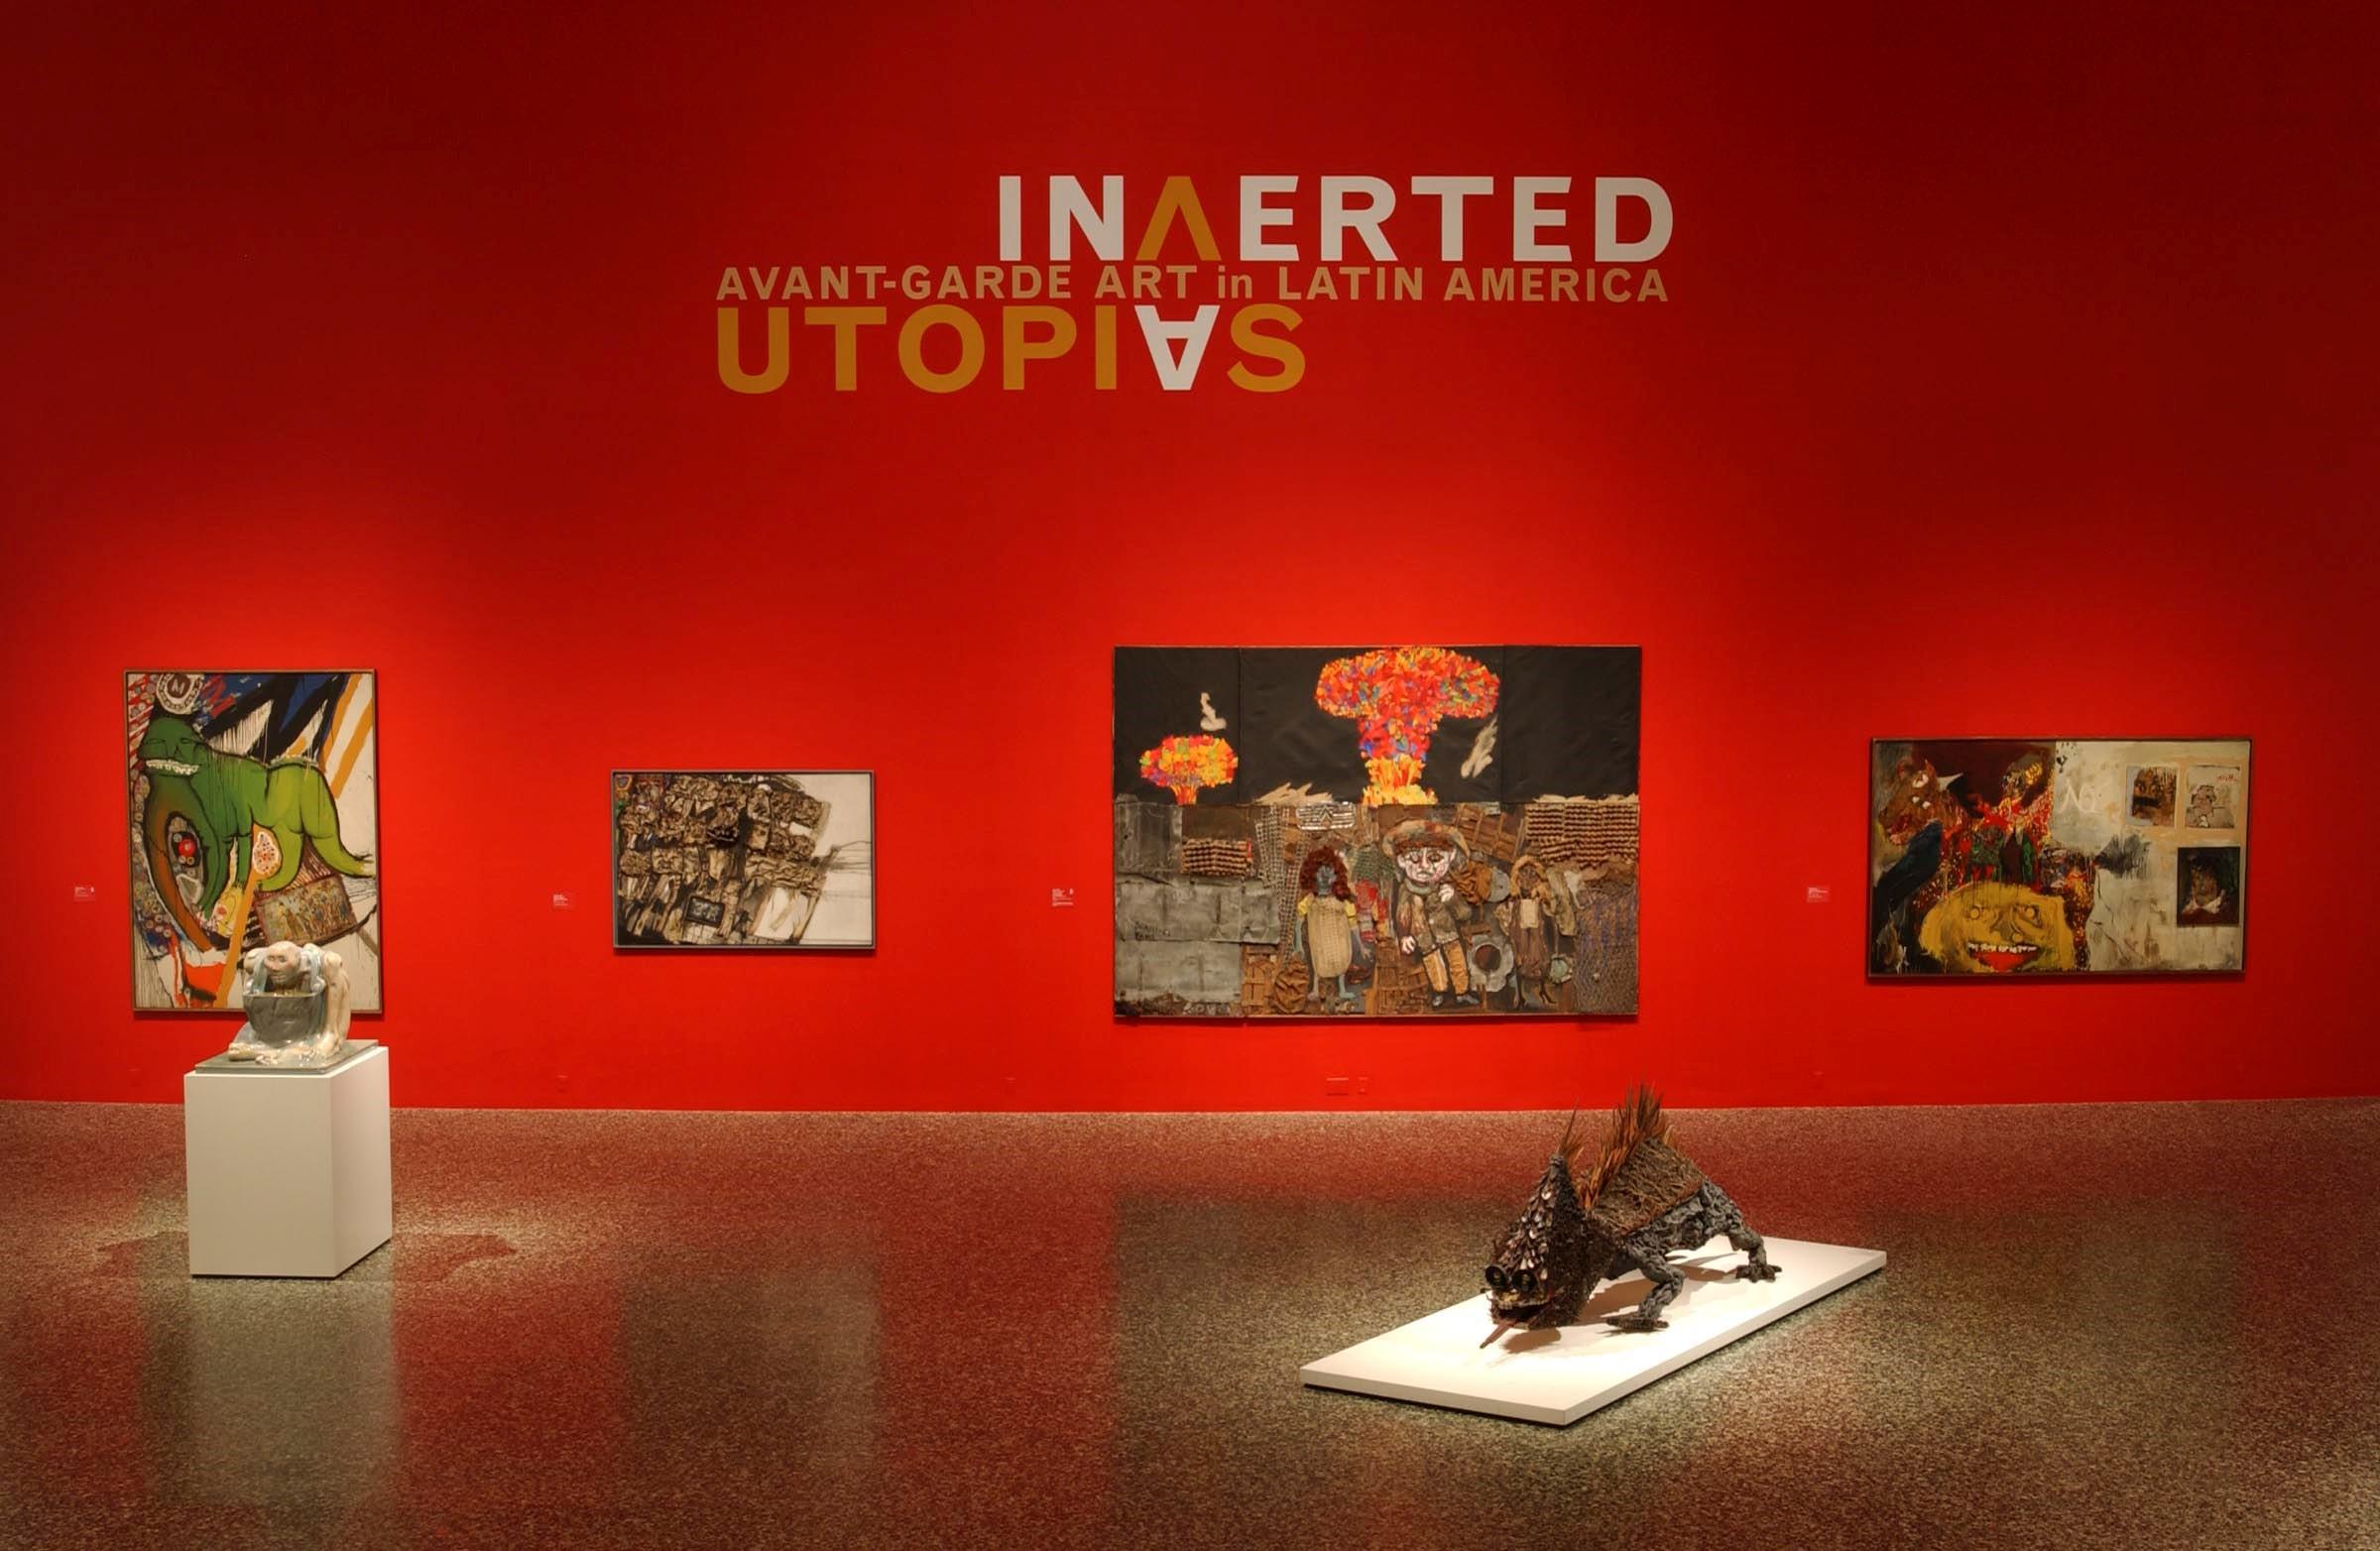 Inverted Utopias: Avant-Garde Art in Latin America